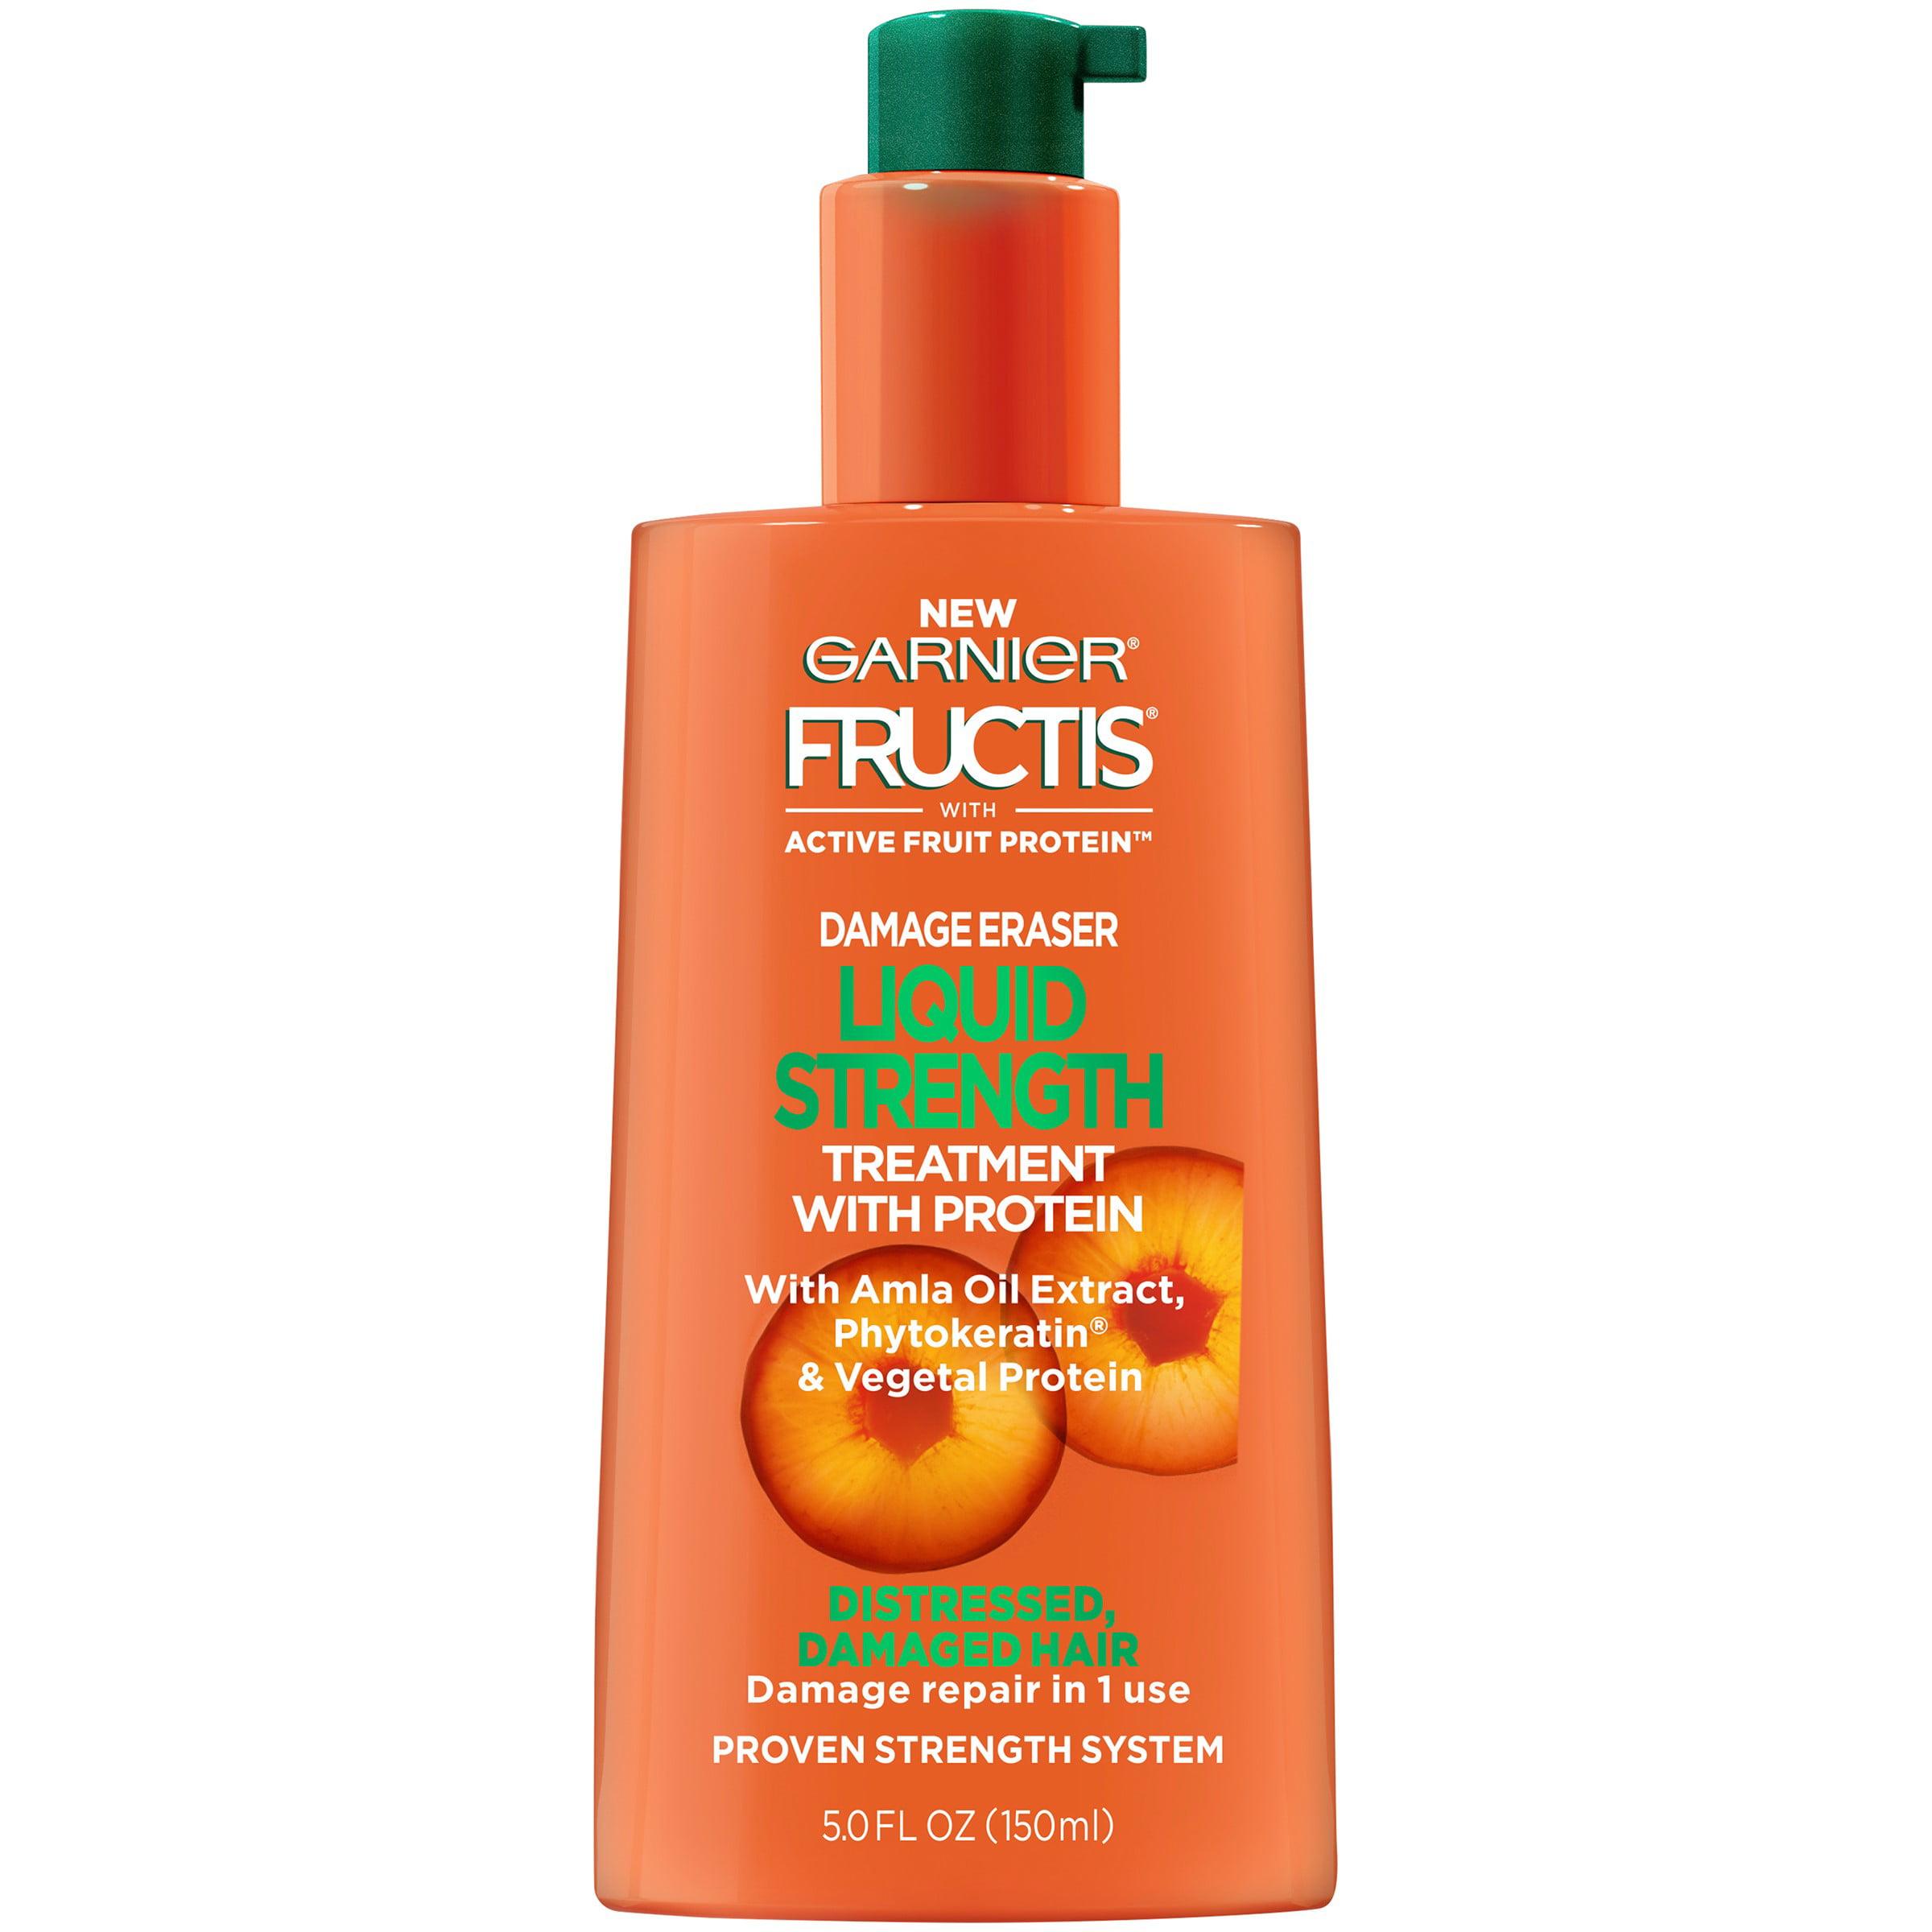 Garnier Fructis Damage Eraser Liquid Strength Treatment, 5 Fl Oz